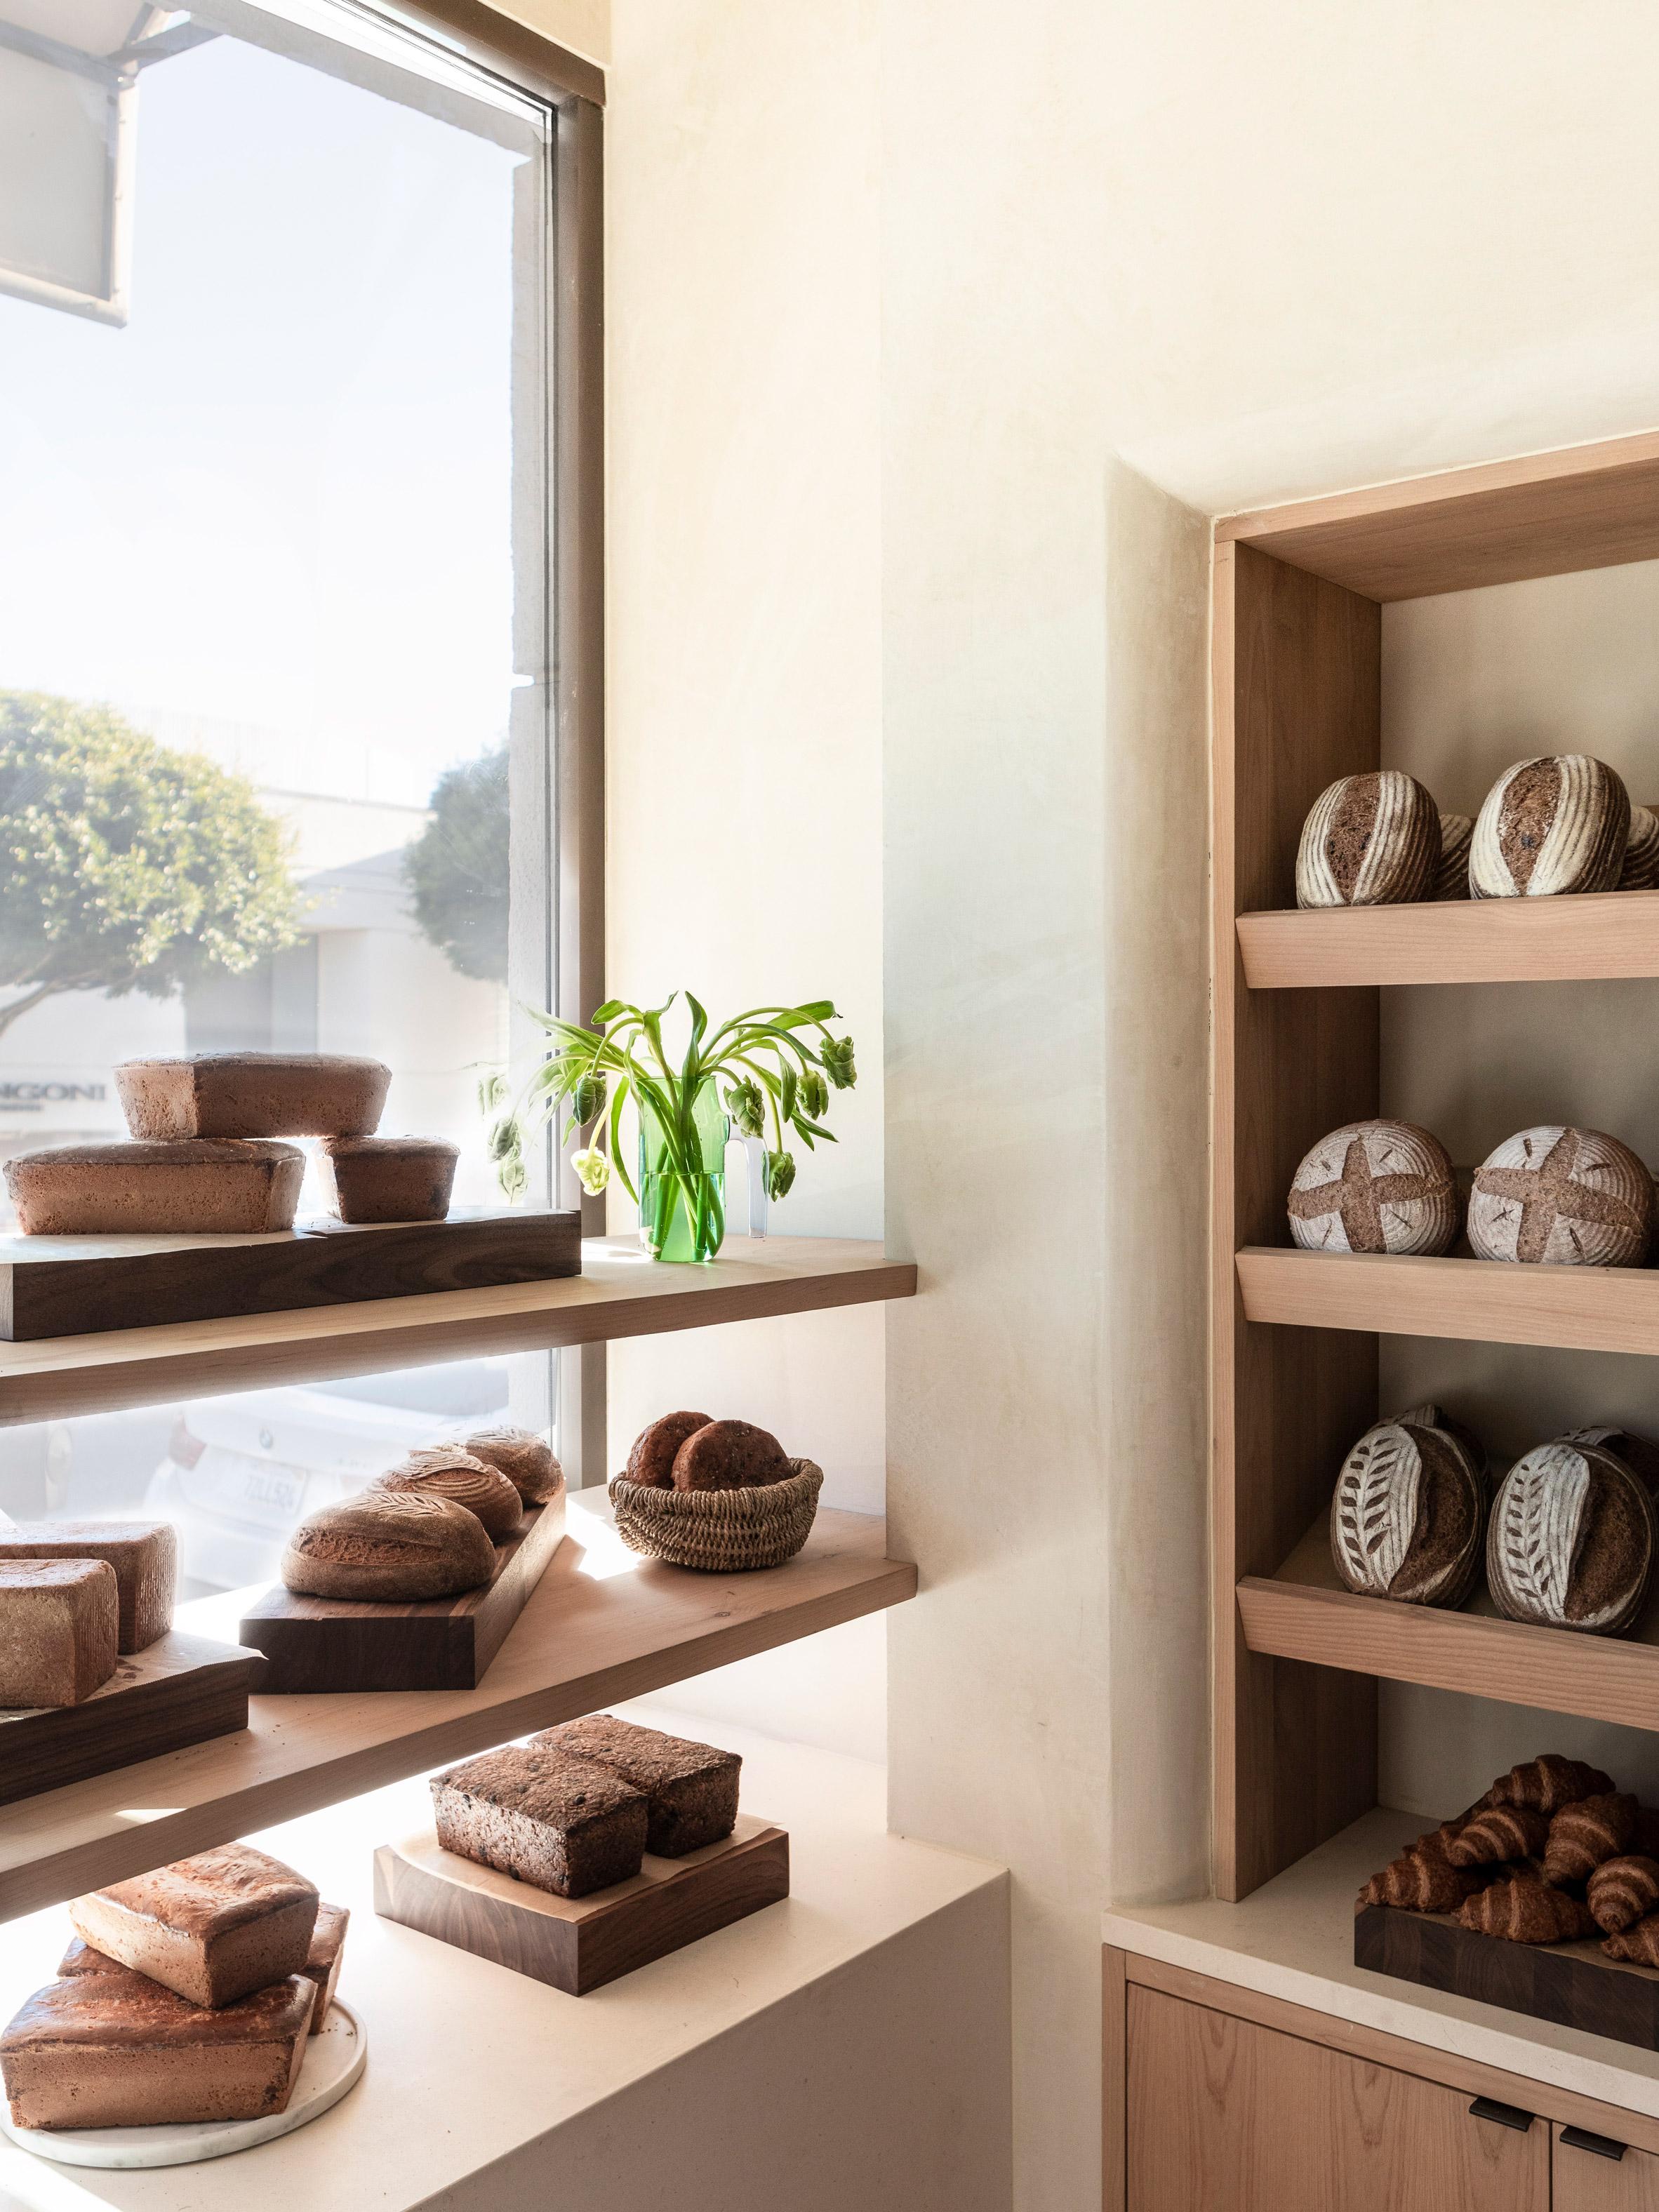 BreadBlok by Commune